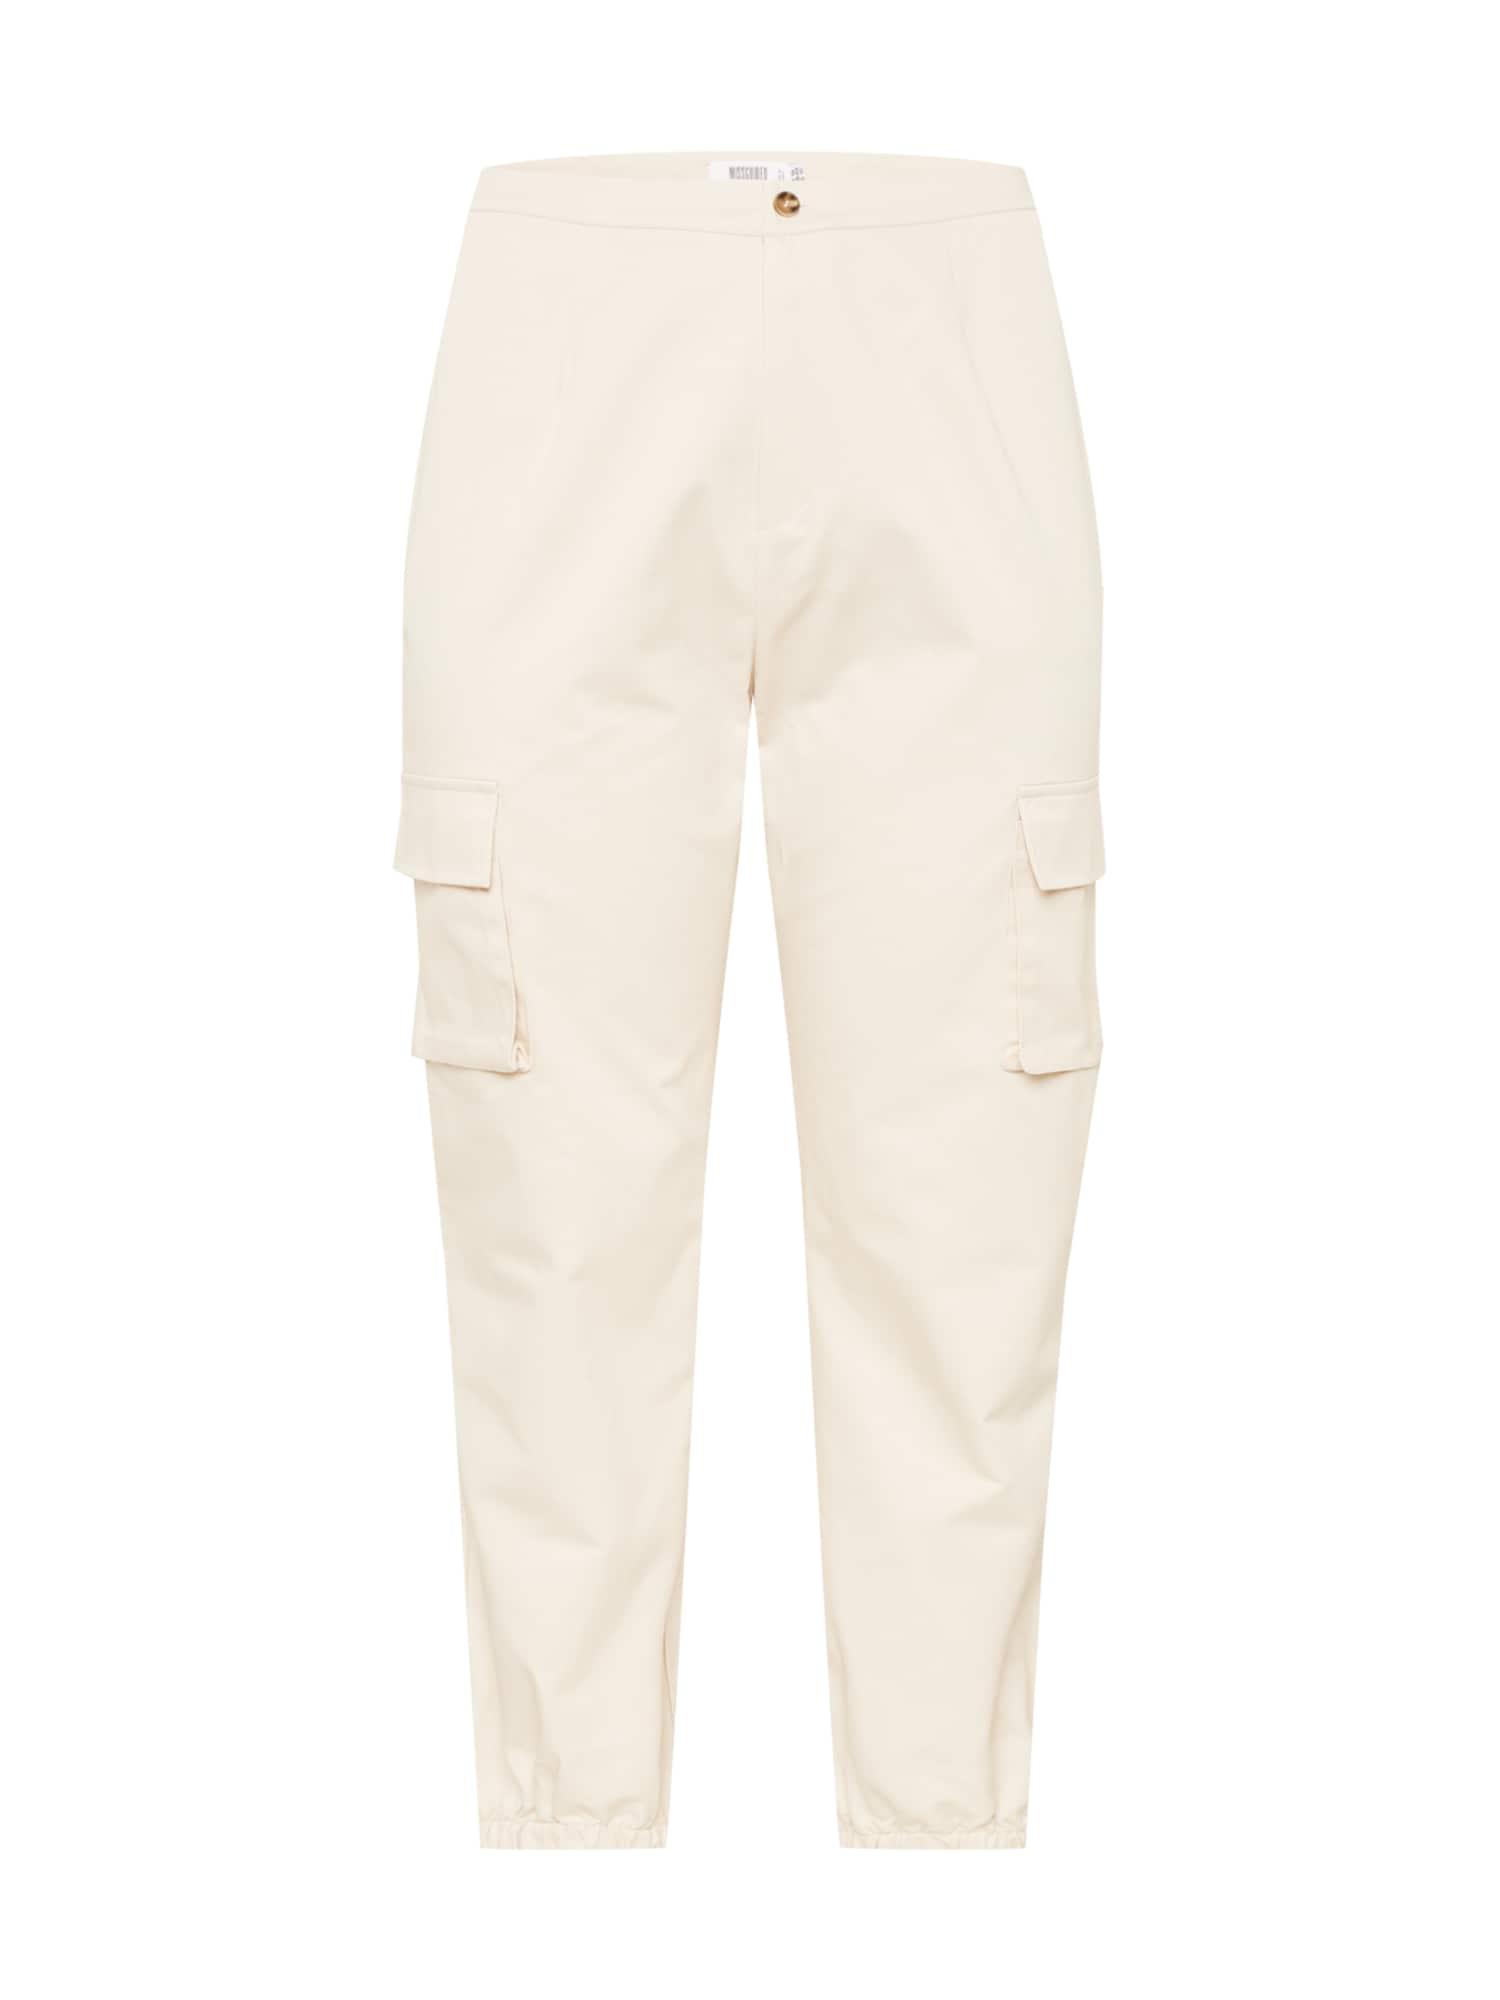 Missguided Plus Laisvo stiliaus kelnės vilnos balta